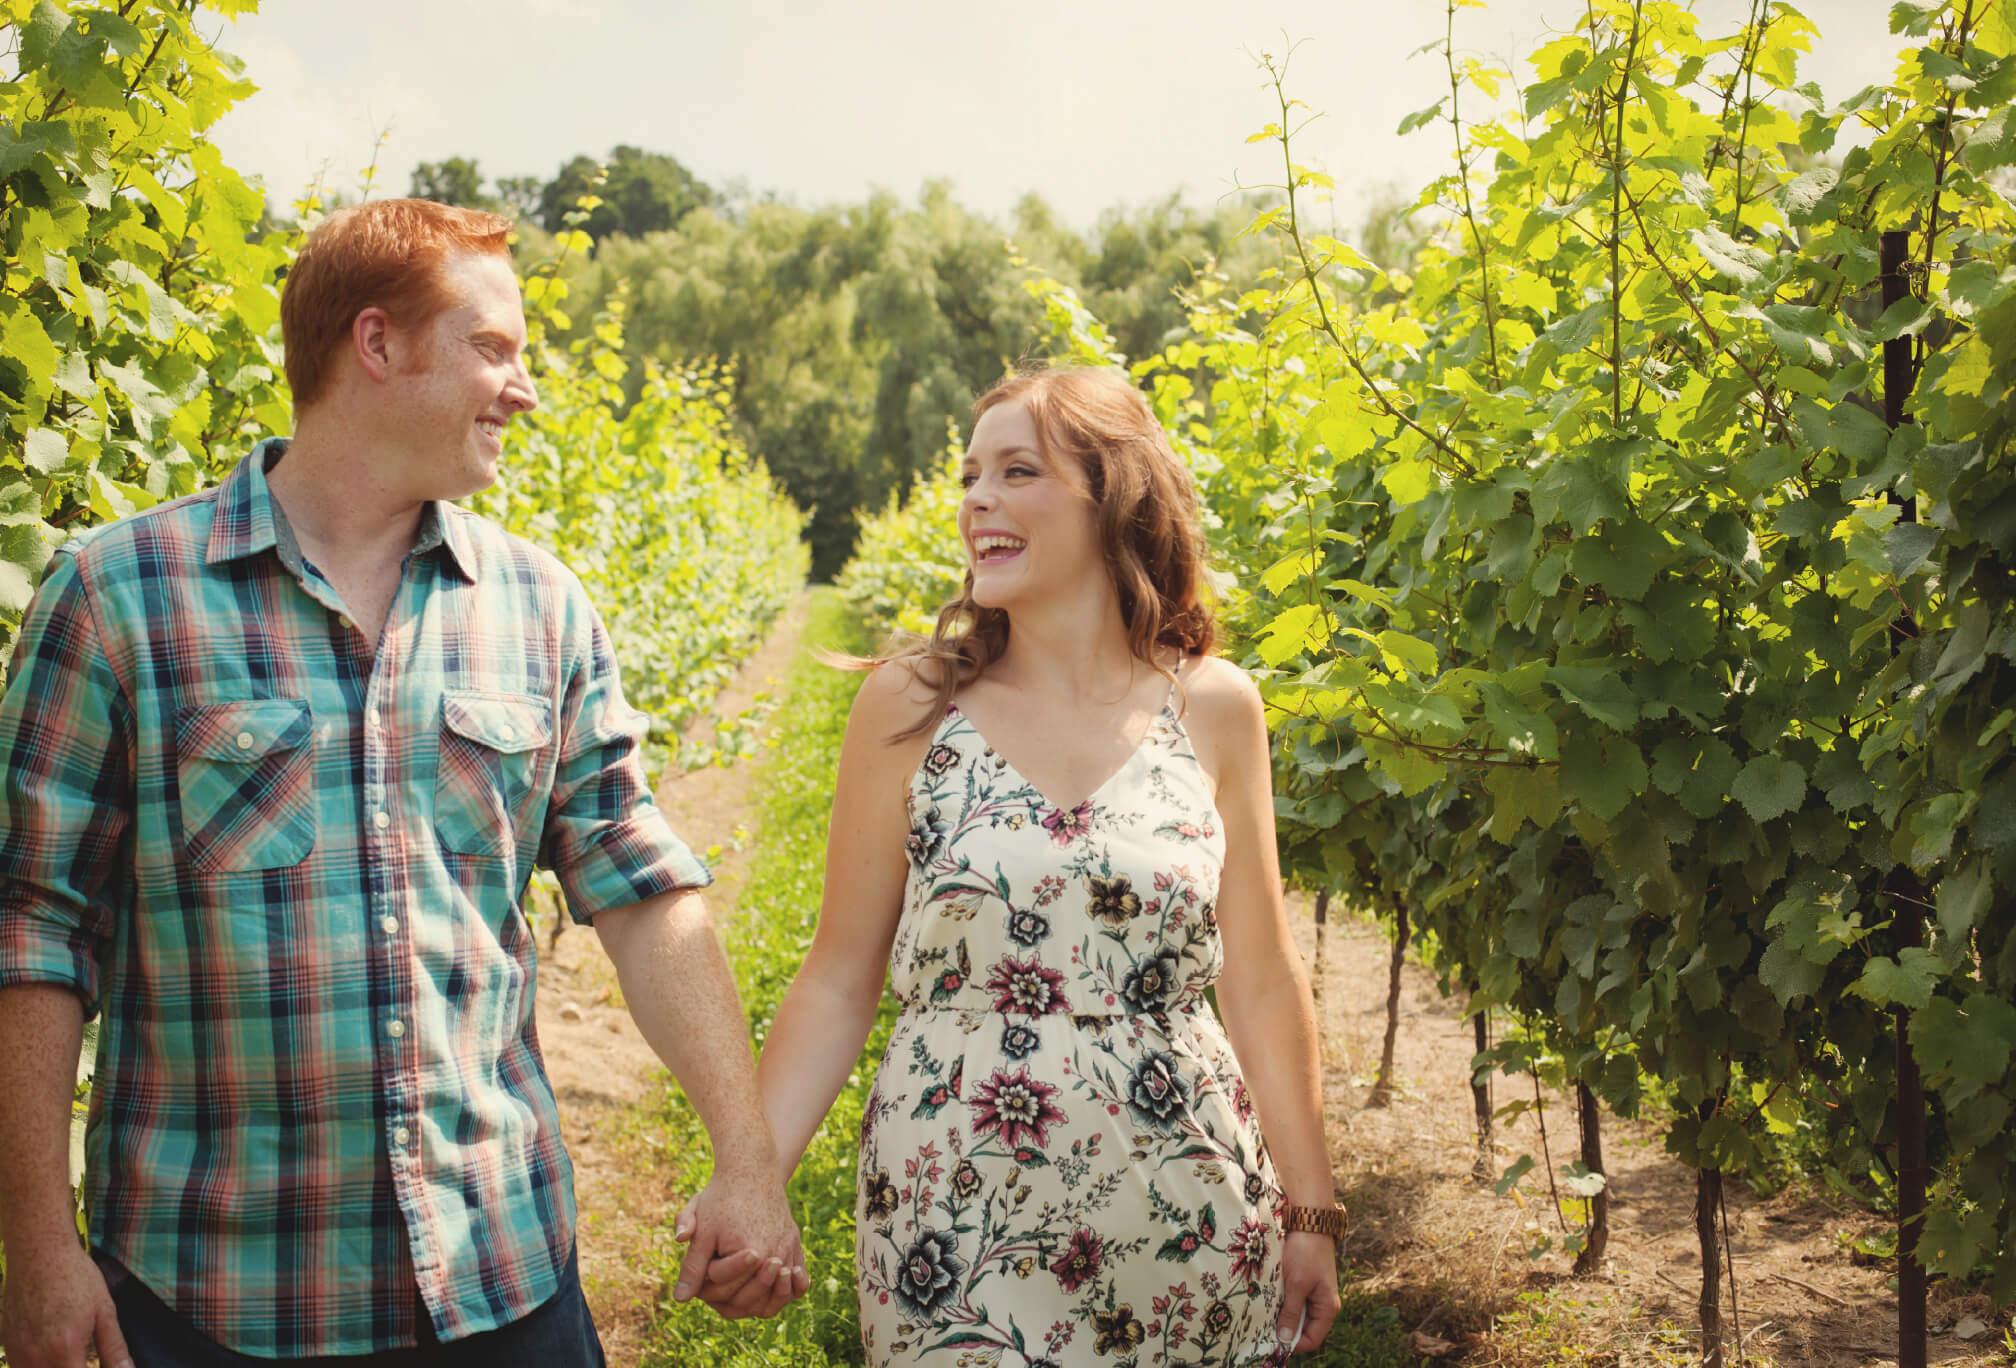 vineland niagara winery engagement